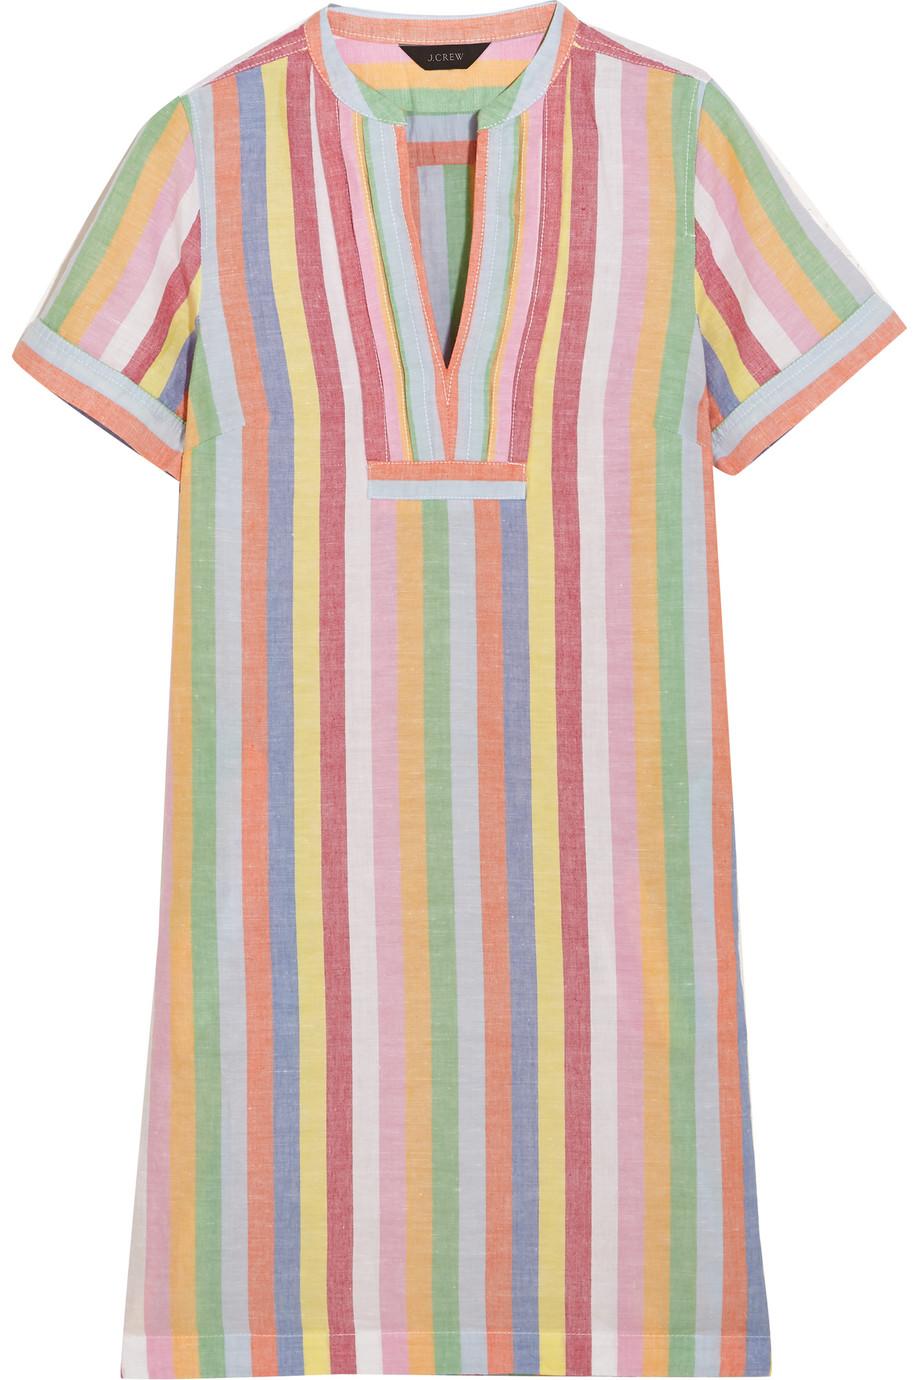 J.Crew Quinlan Striped Cotton, Ramie and Linen-Blend Mini Dress, Blue, Women's - Striped